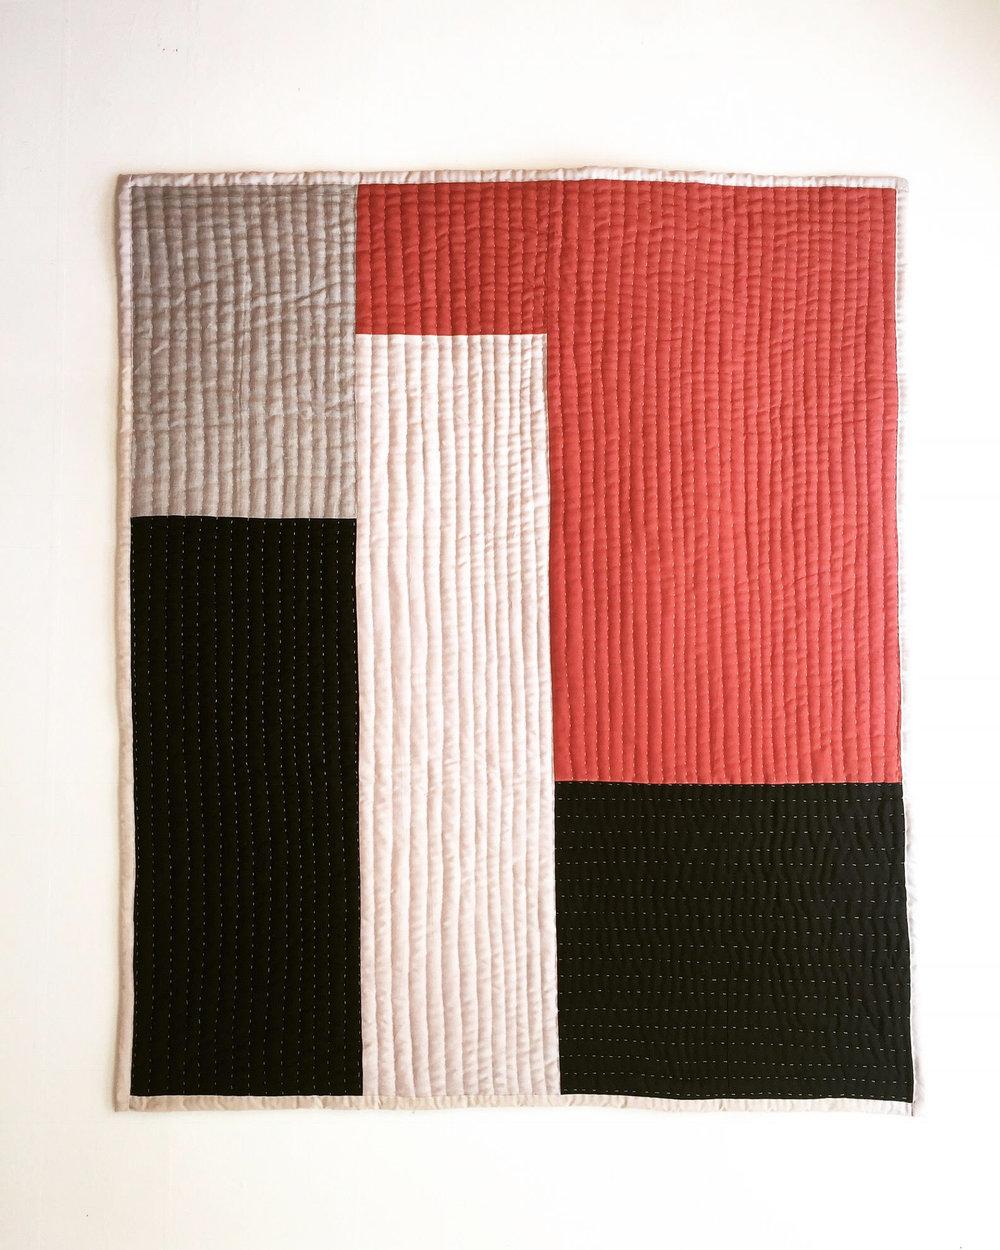 Oki Quilt 140x170 cm